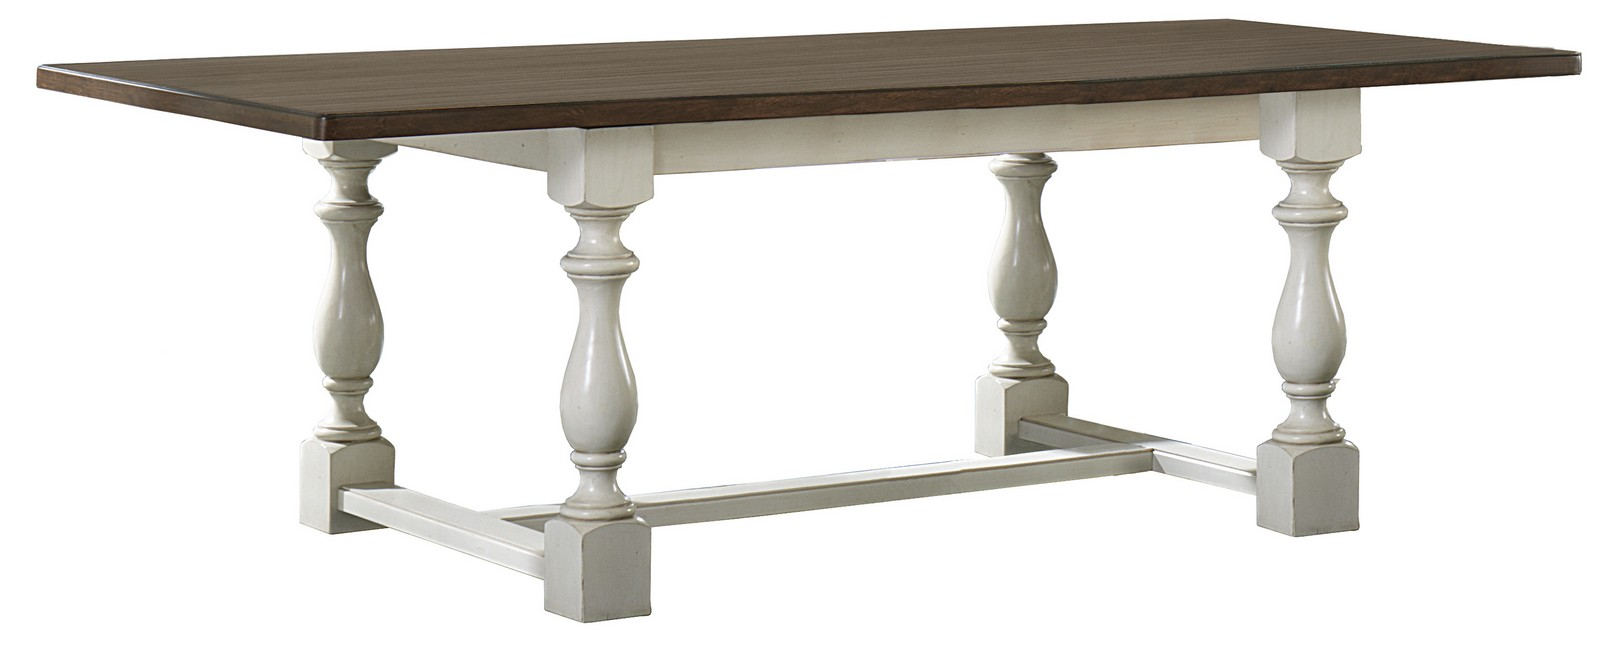 Superior Hillsdale Pine Island Leg Trestle Table   Old White